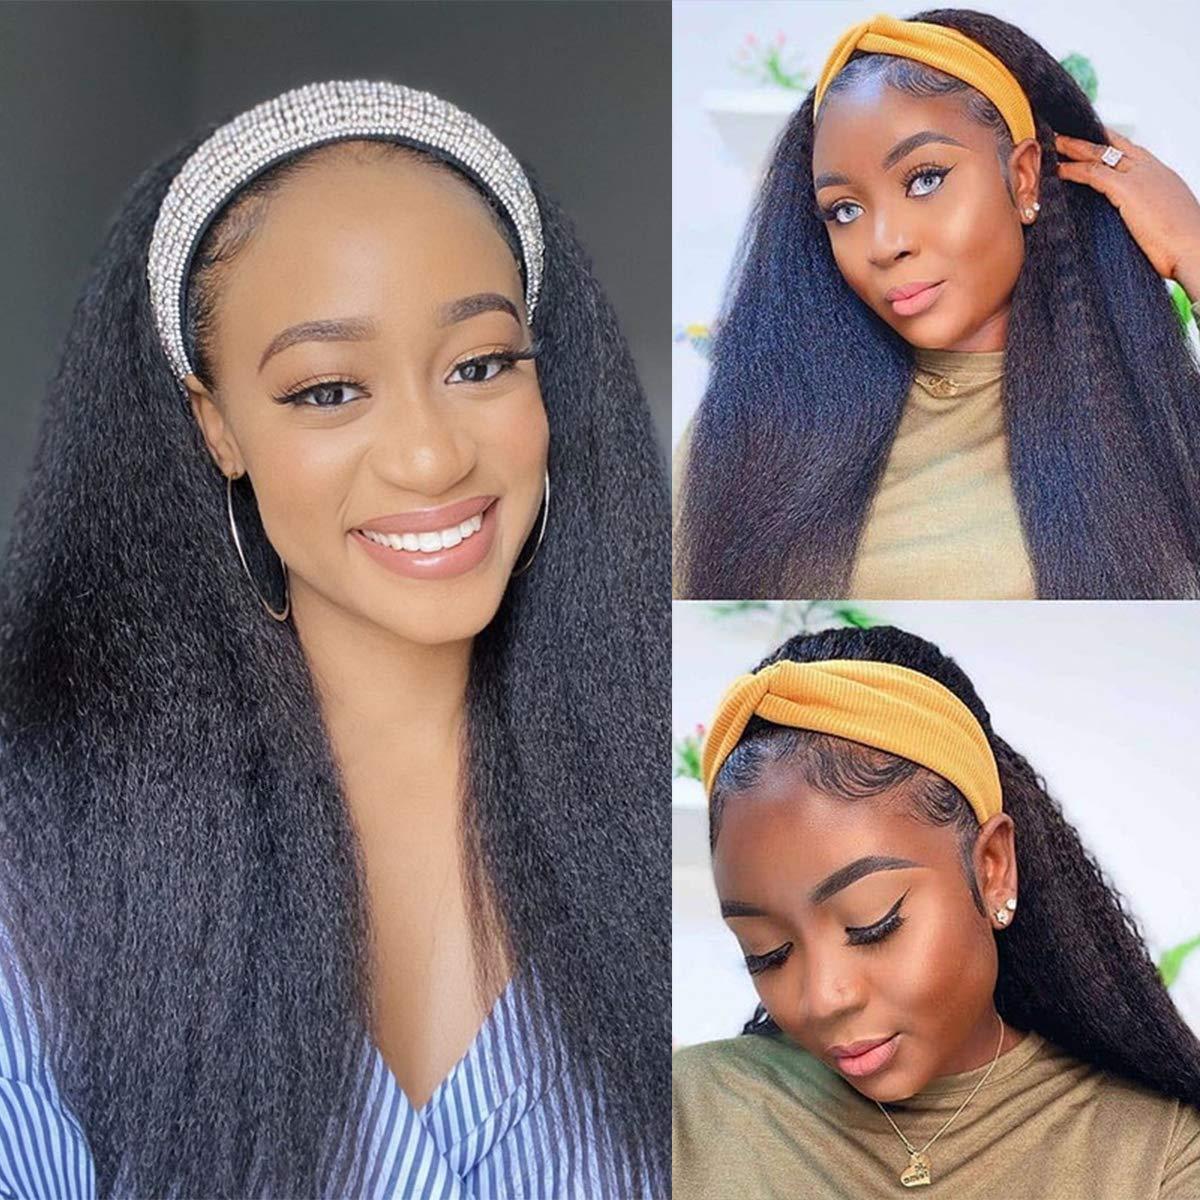 Headband Wigs for Black Women Kinky Straight Headband Wigs Italian Yaki Human Hair Wigs Glueless None Lace Front Wigs Scarf Wigs Machine Made Headband Wigs 20 Inch (Natural Color,Headband Wig)